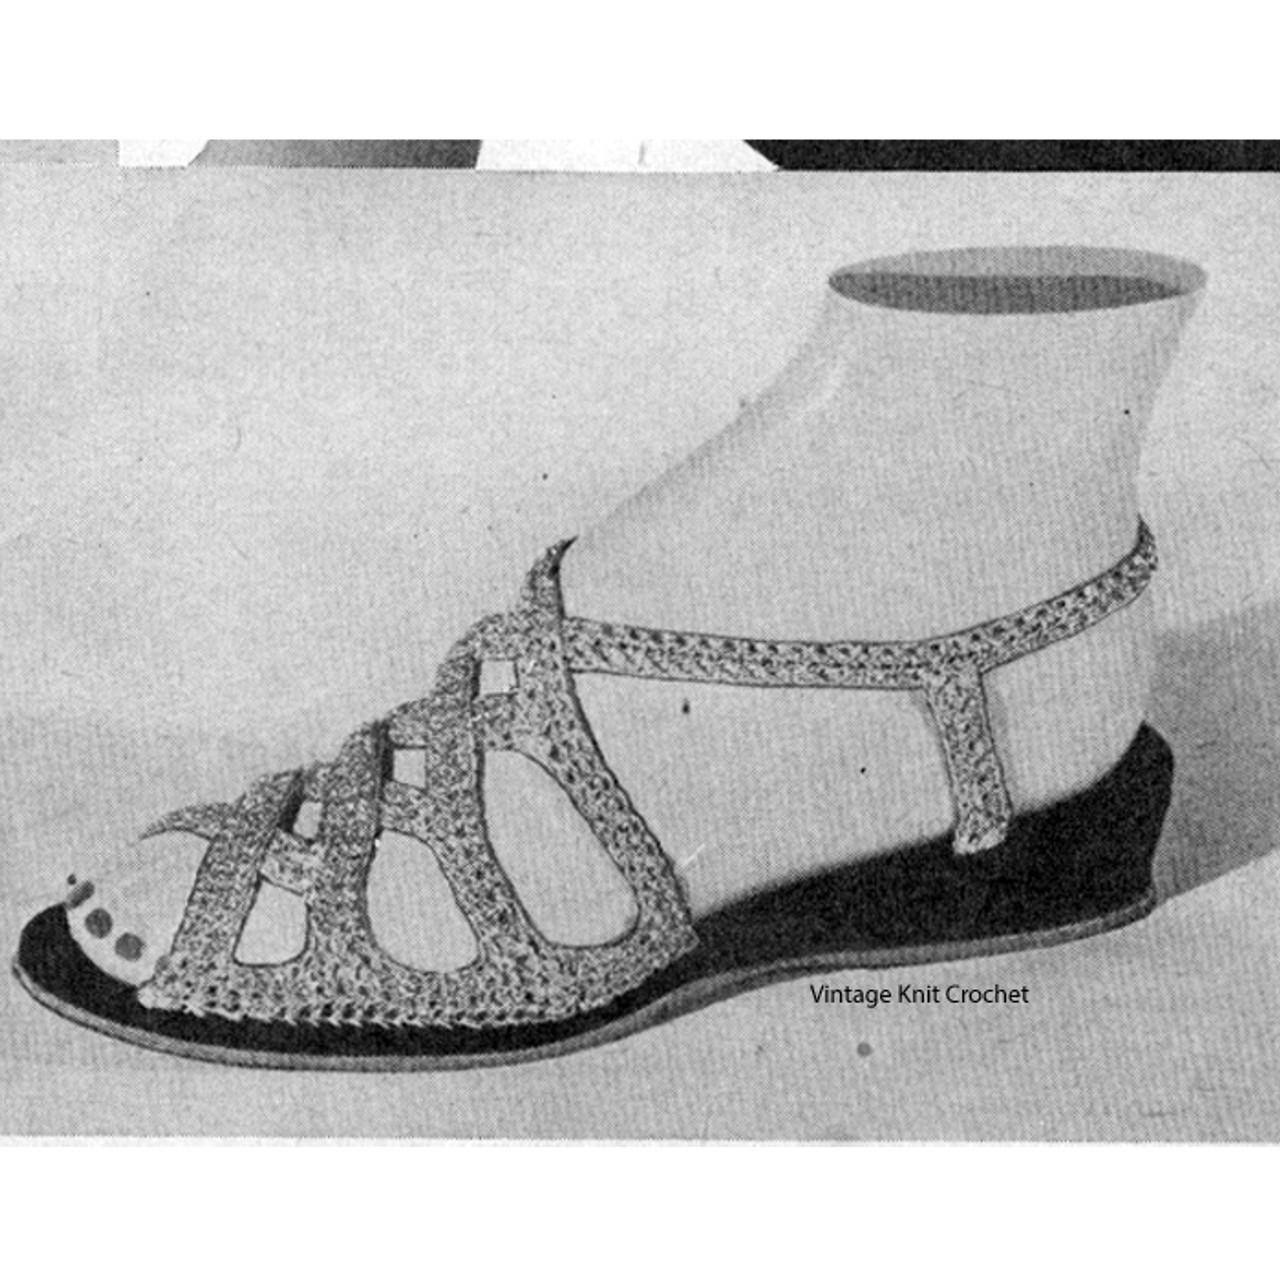 Vintage Crocheted Wedge Sandals Pattern